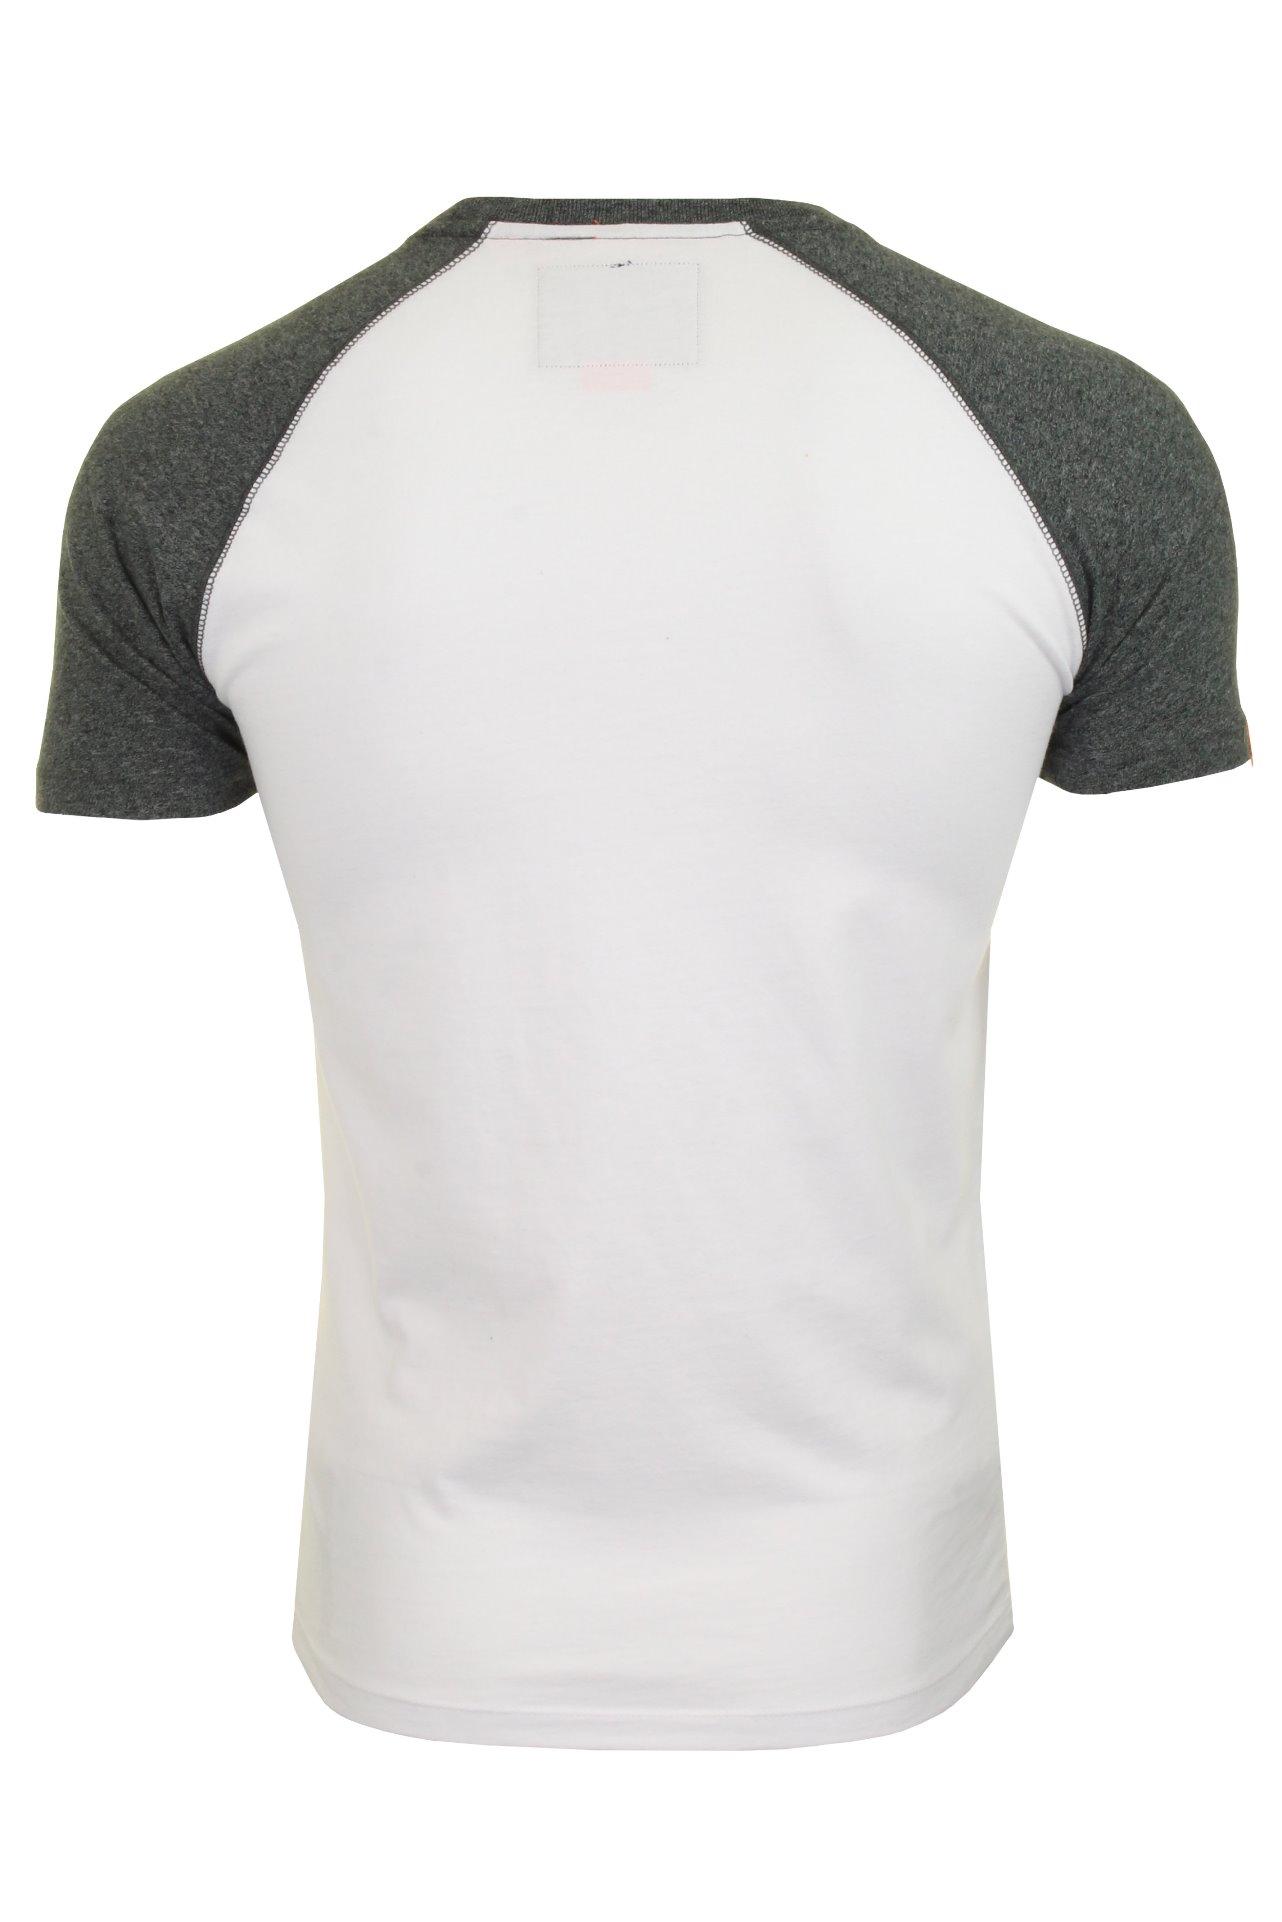 Superdry-Mens-039-Baseball-039-Raglan-Short-Sleeved-T-Shirt thumbnail 8